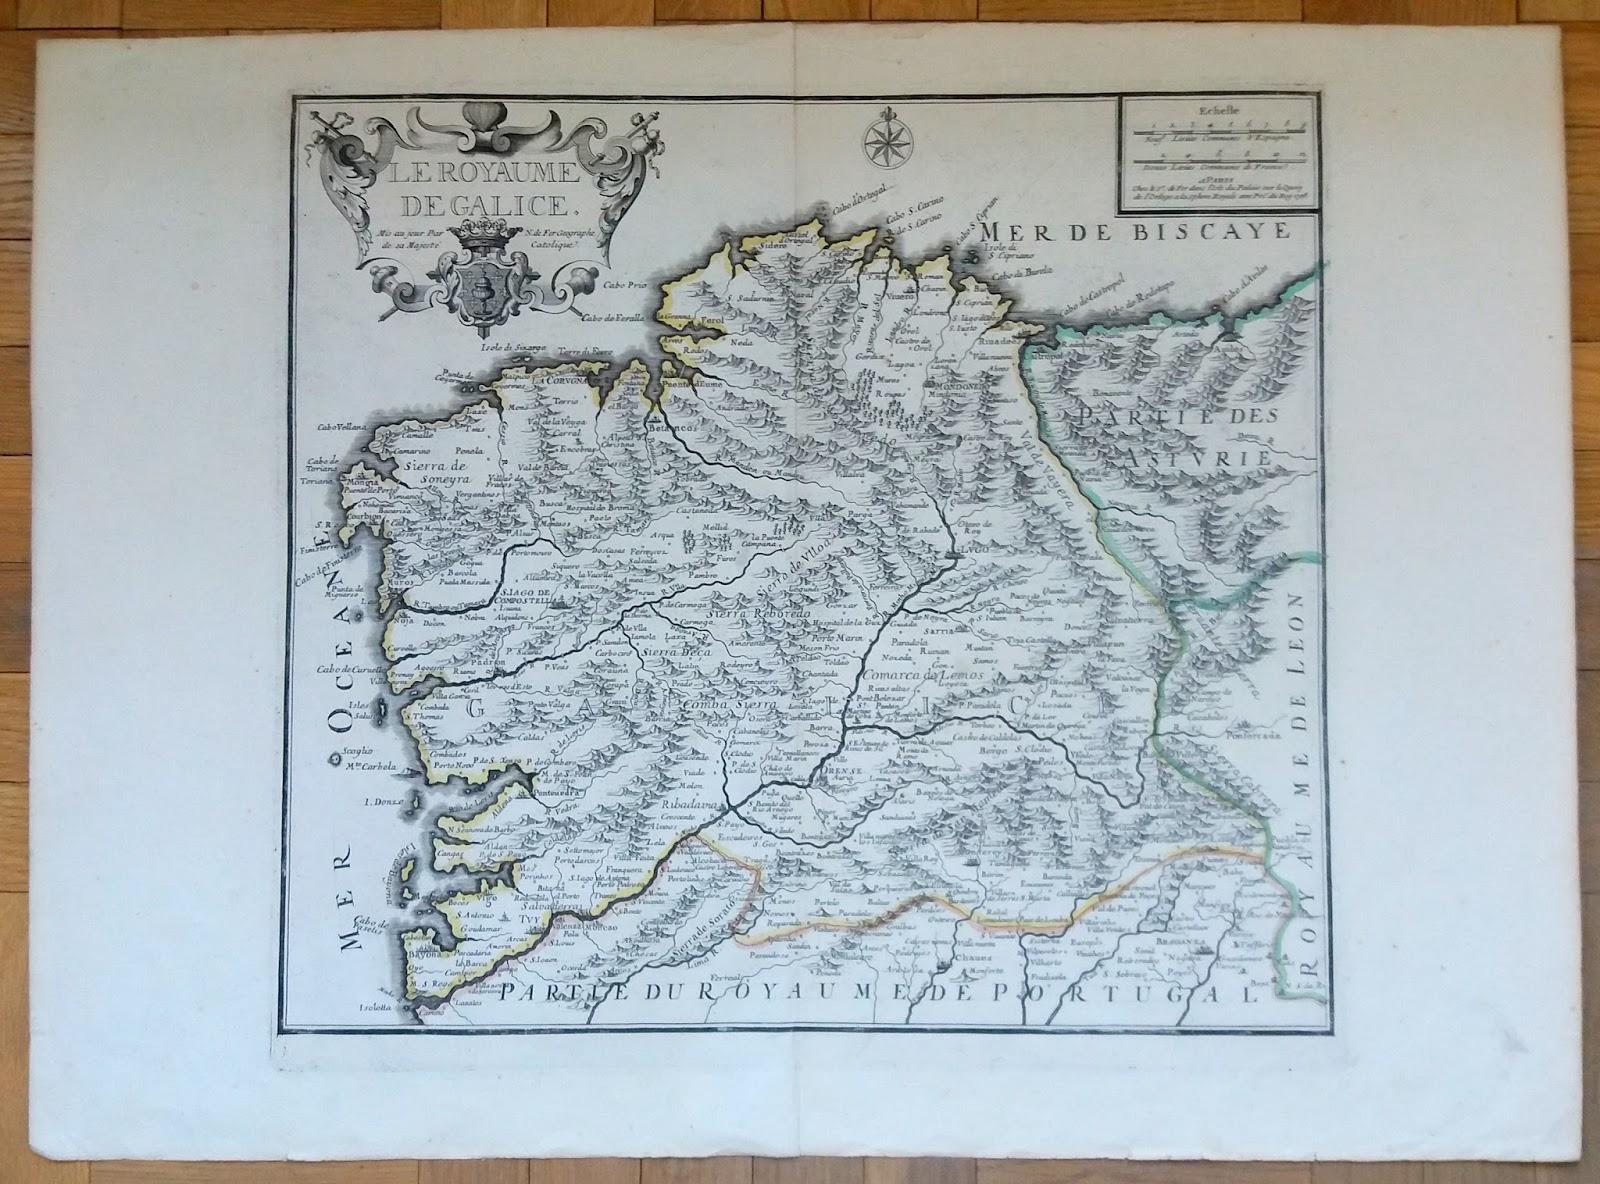 Mapa antiguo Galicia | Mapas antiguos Cartografía histórica